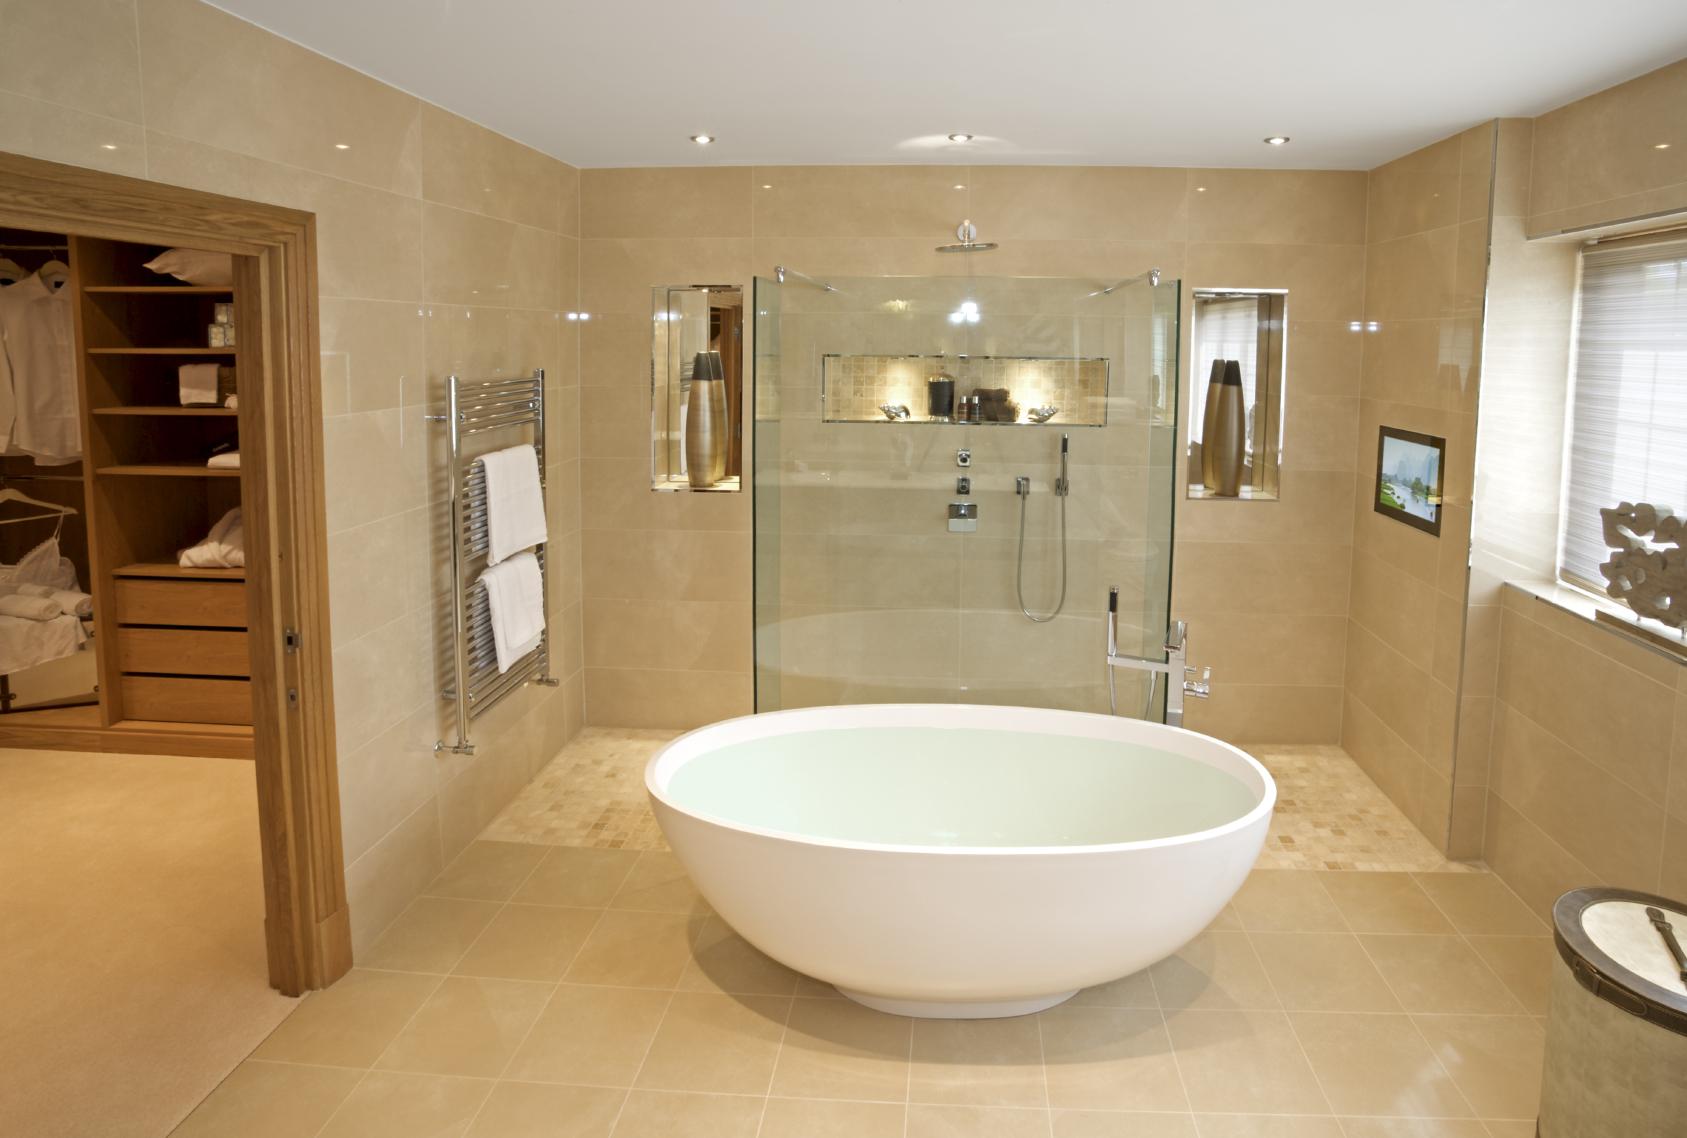 Amazing 45 Modern Bathroom Interior Design Ideas Largest Home Design Picture Inspirations Pitcheantrous